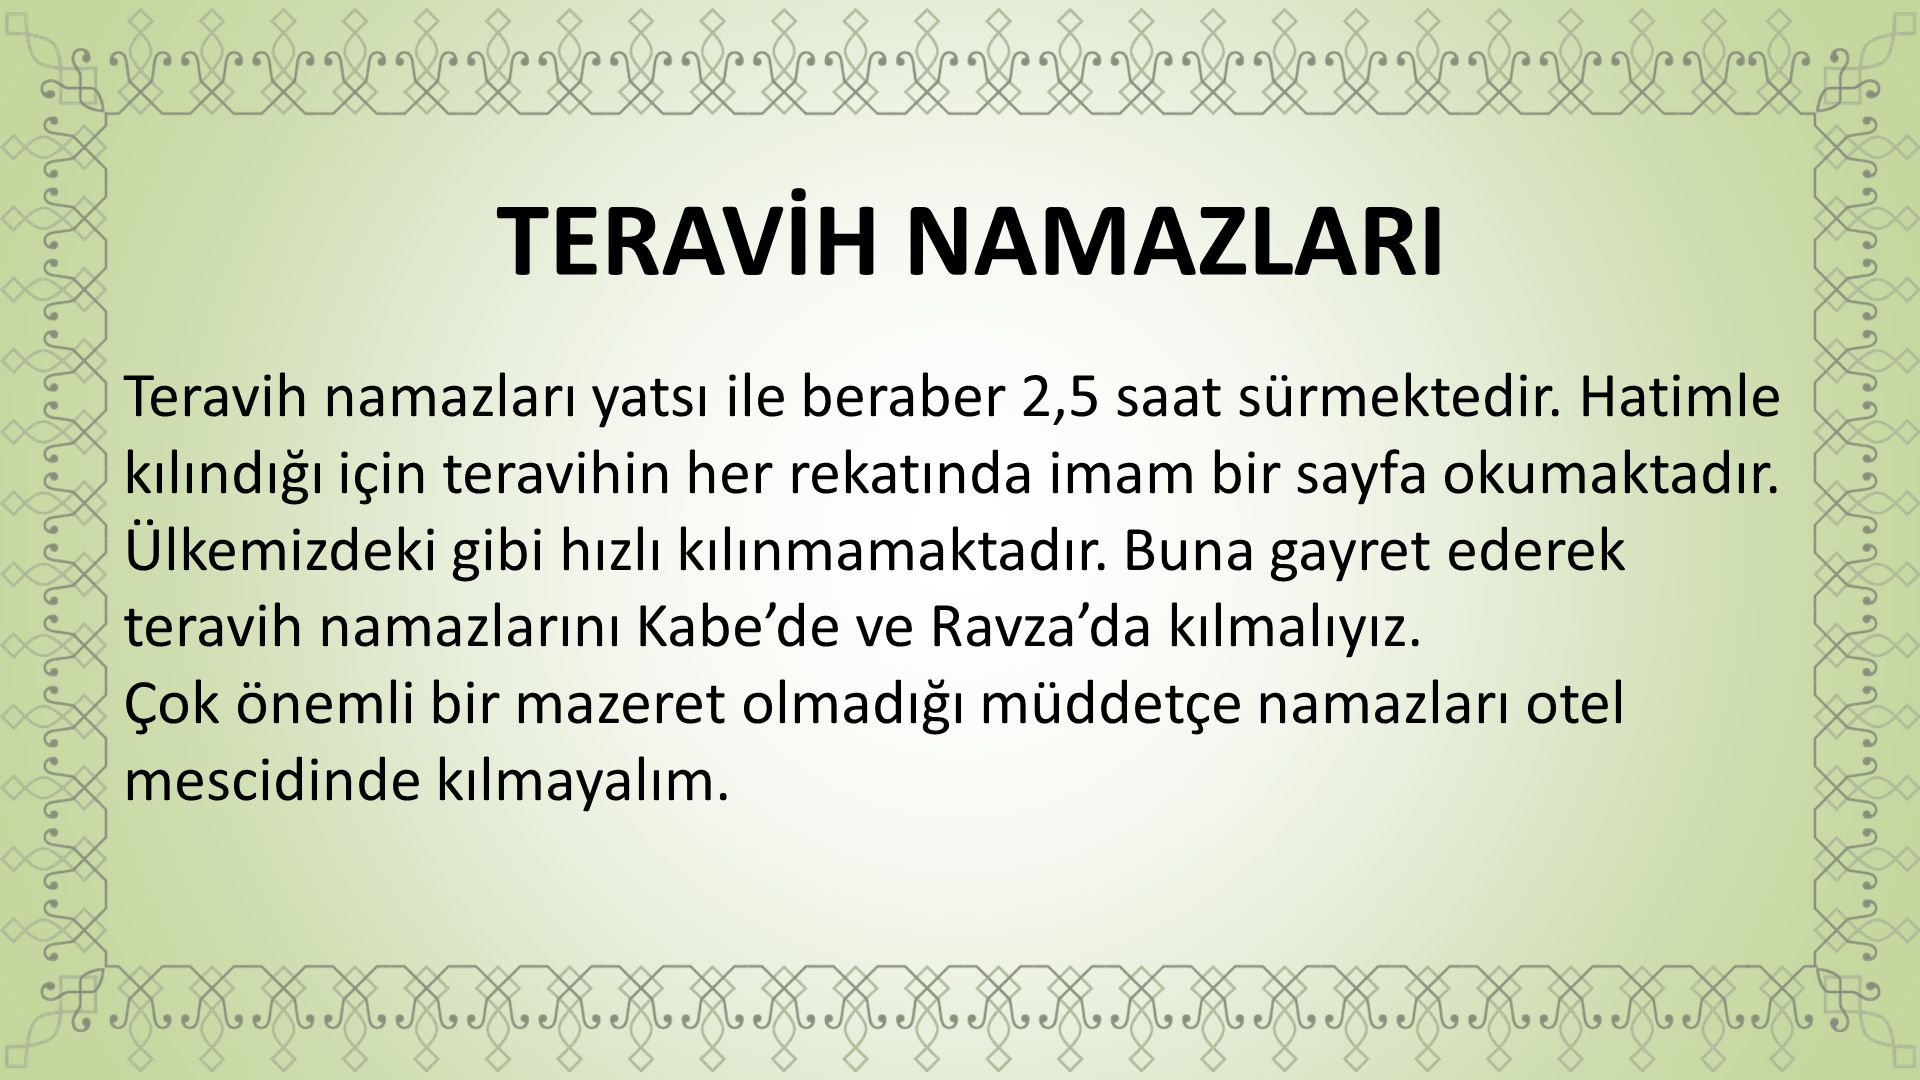 TERAVİH NAMAZLARI